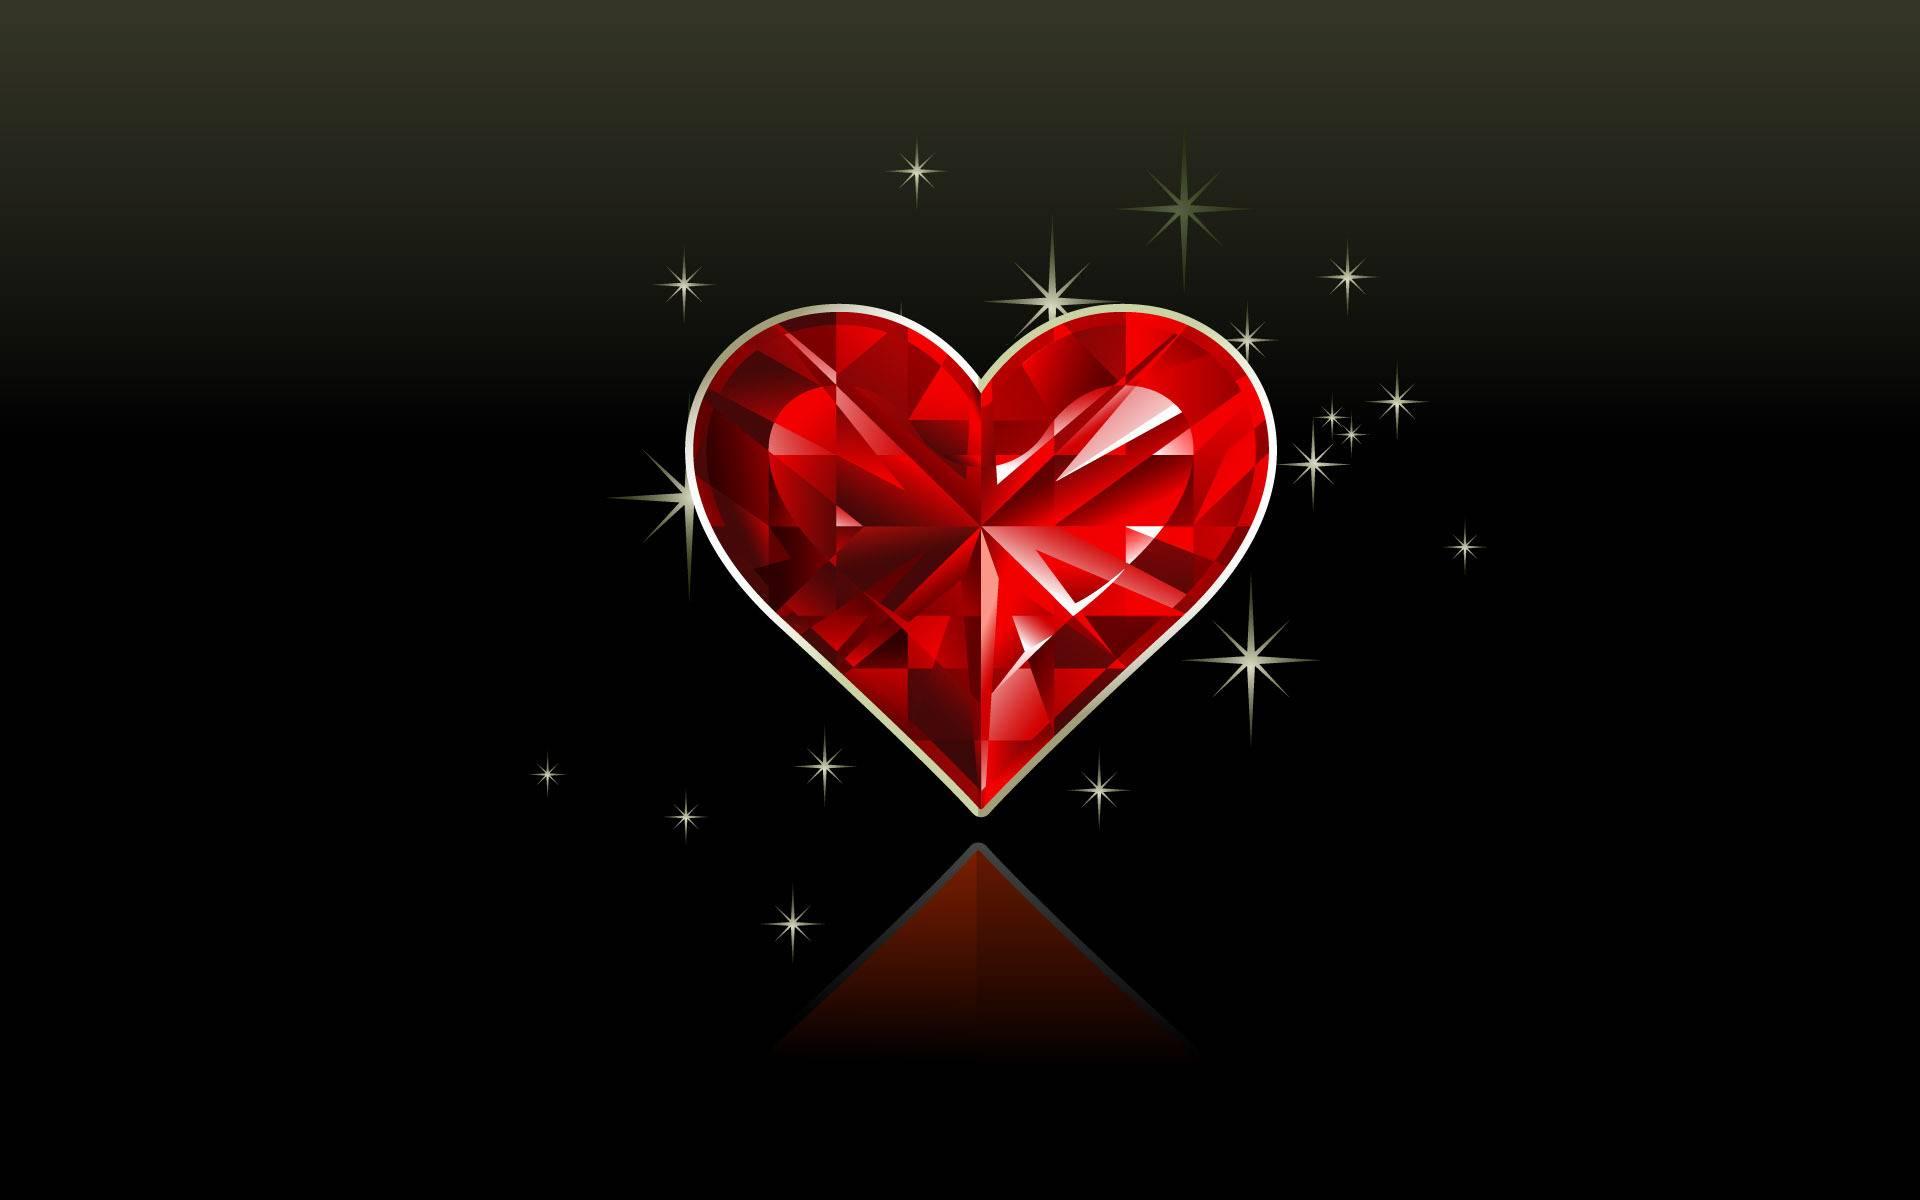 Diamond Love Red Heart Image Wallpaper 13958 Wallpaper 1920x1200